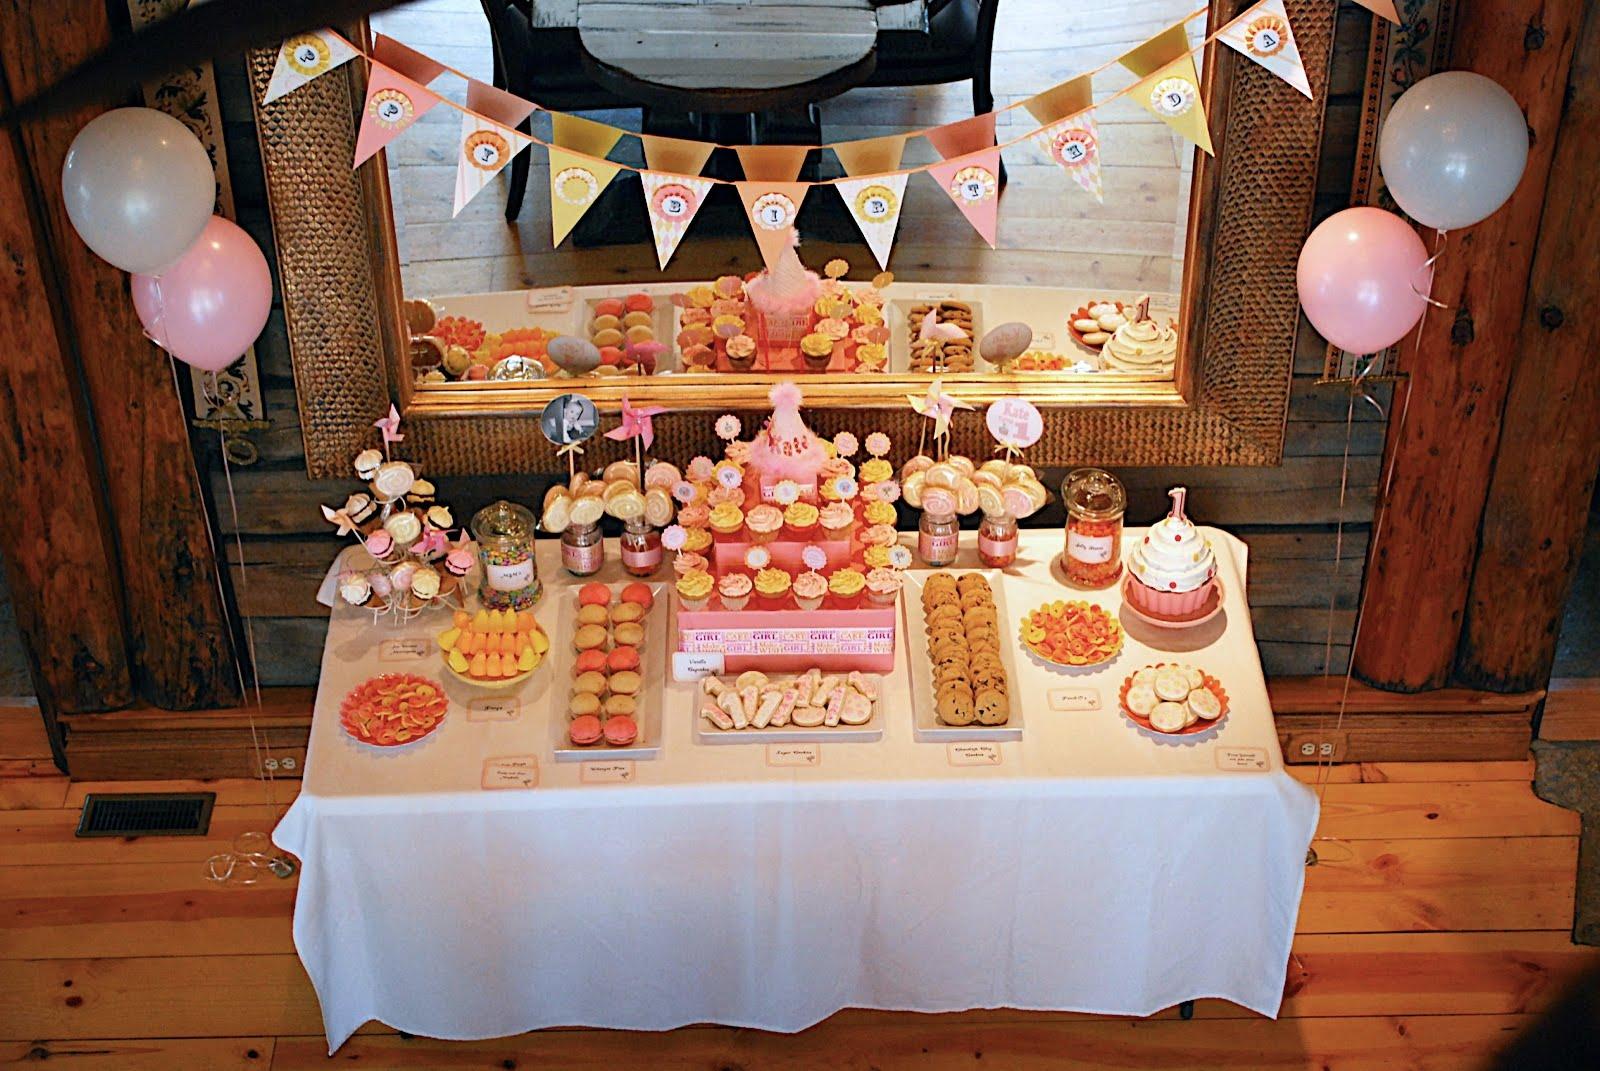 Occasional Cookies 1st Birthday Dessert Buffet